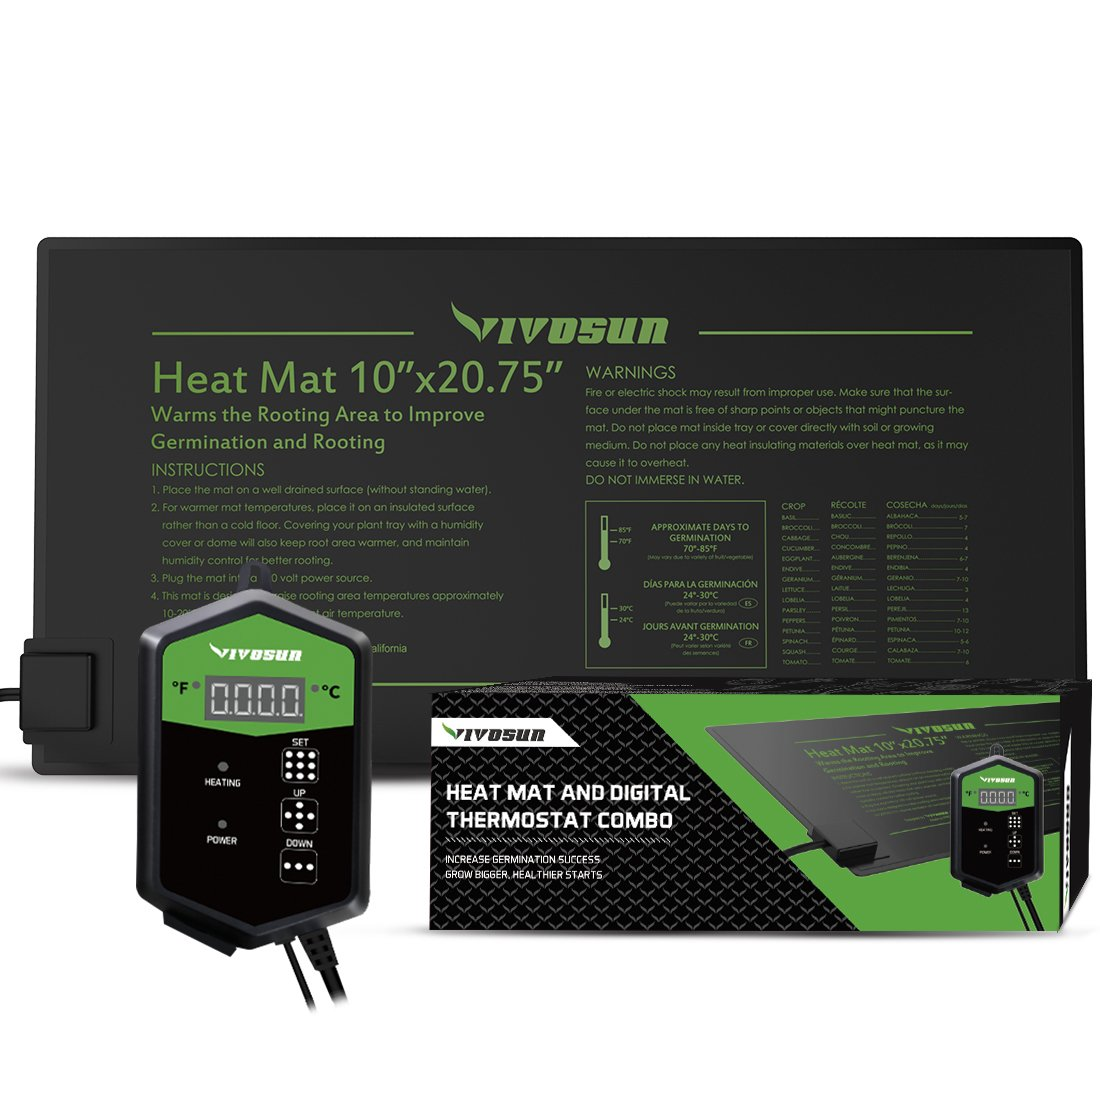 VIVOSUN 10''x20.75'' Seedling Heat Mat and Digital Thermostat Combo Set MET Standard